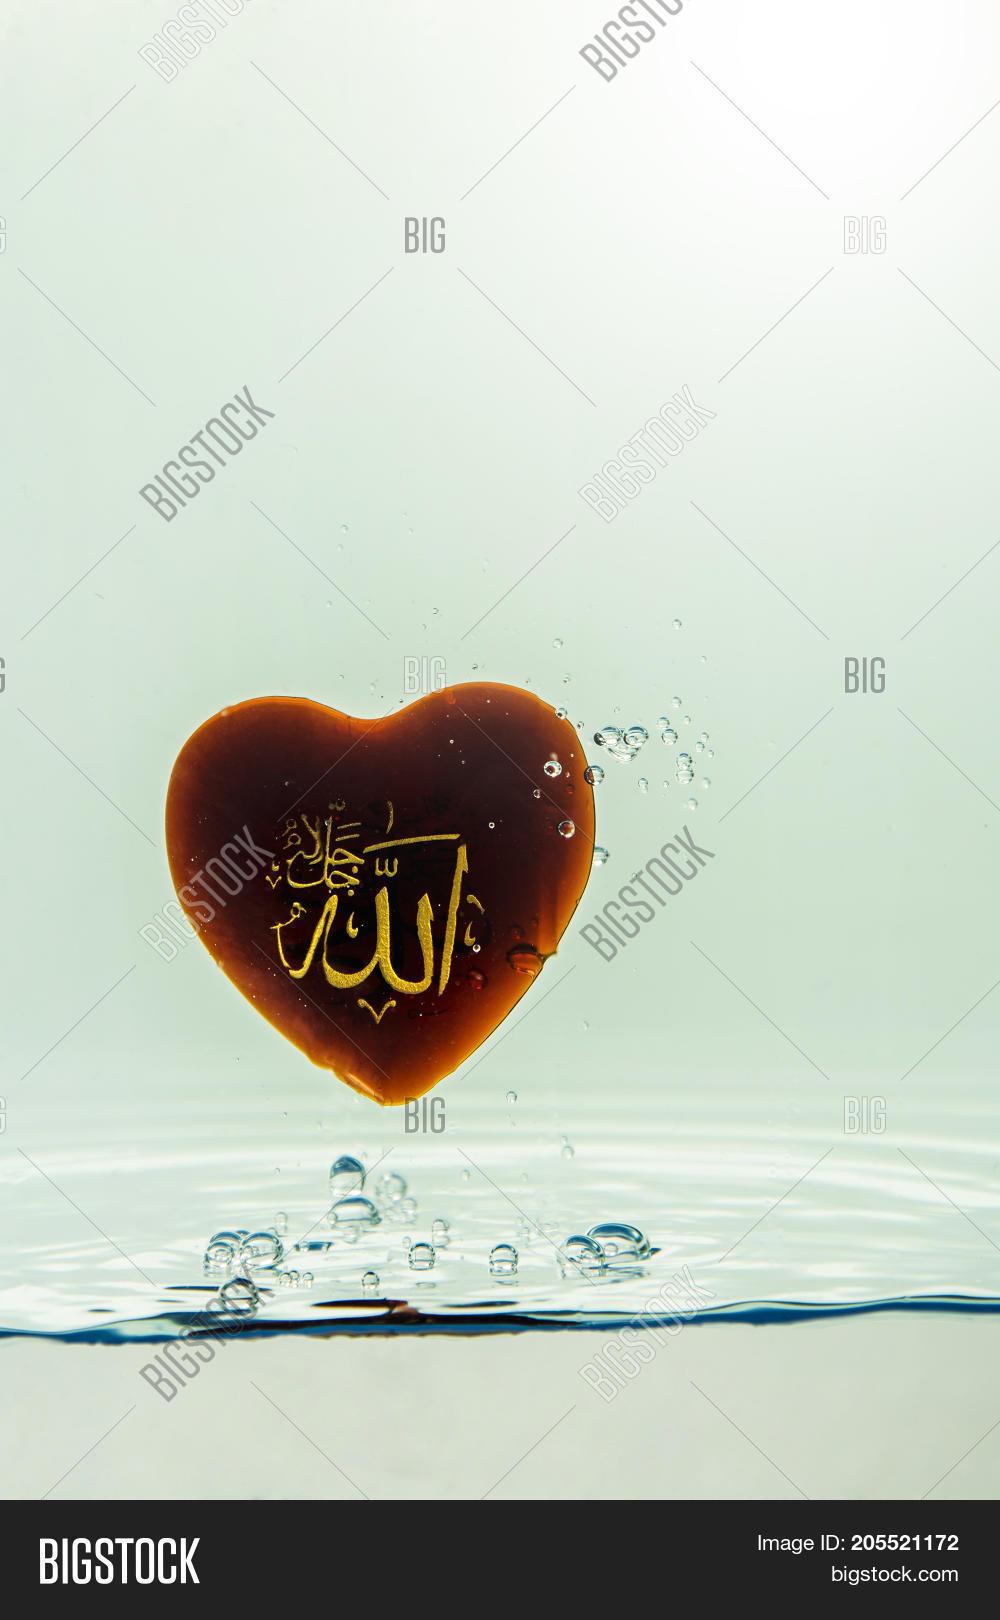 Allah God Islam Symbol Water Image Photo Bigstock